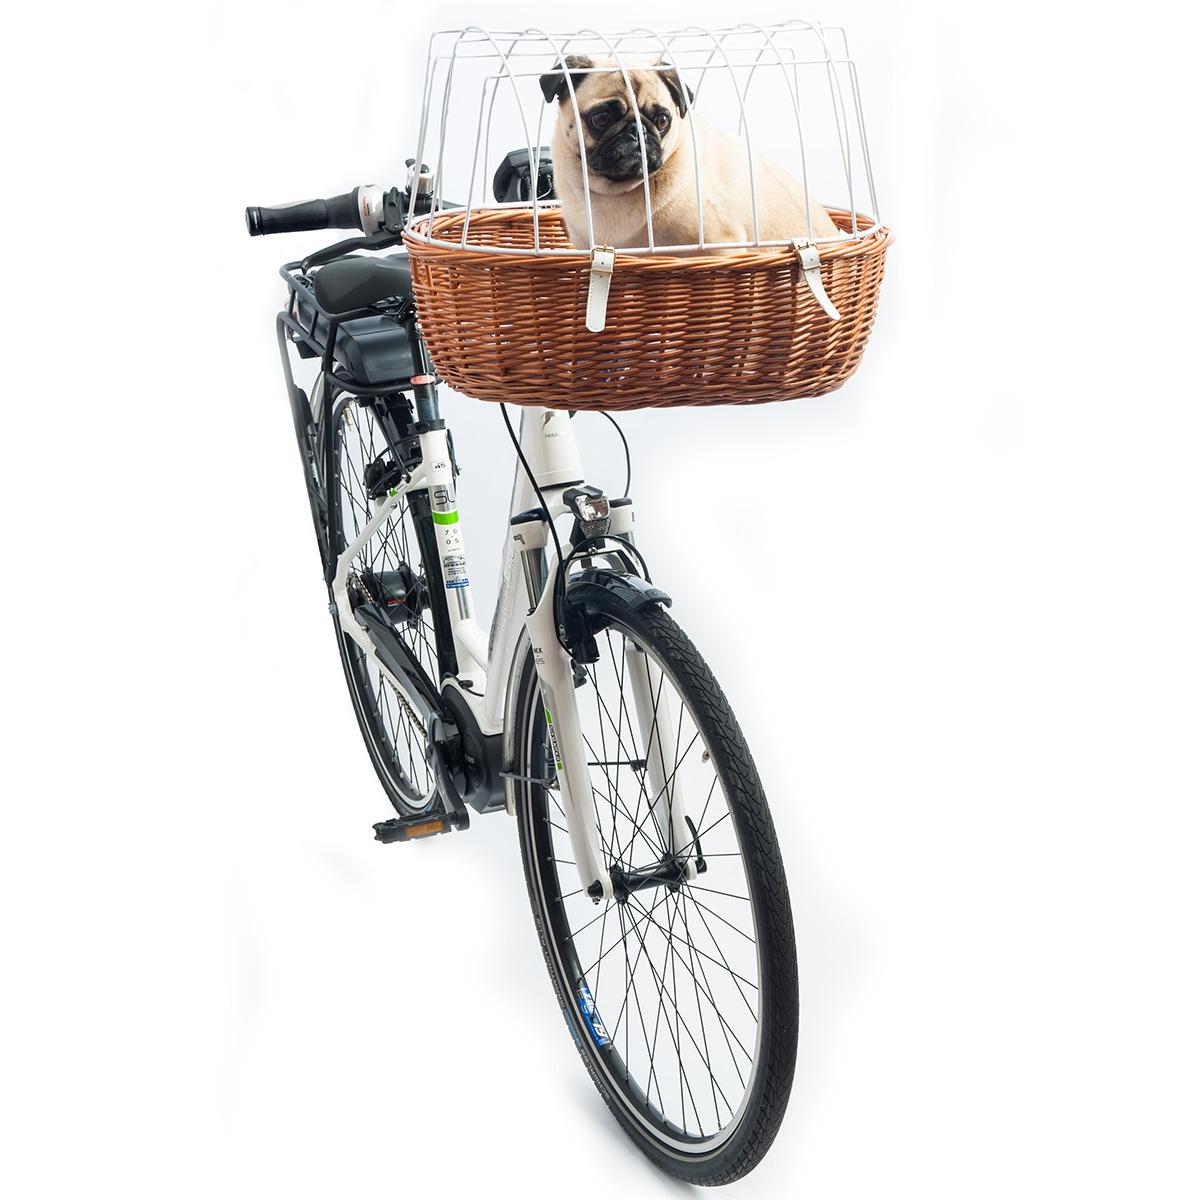 aum ller fahrrad tierkorb e bike f hig kaufen bei zooroyal. Black Bedroom Furniture Sets. Home Design Ideas